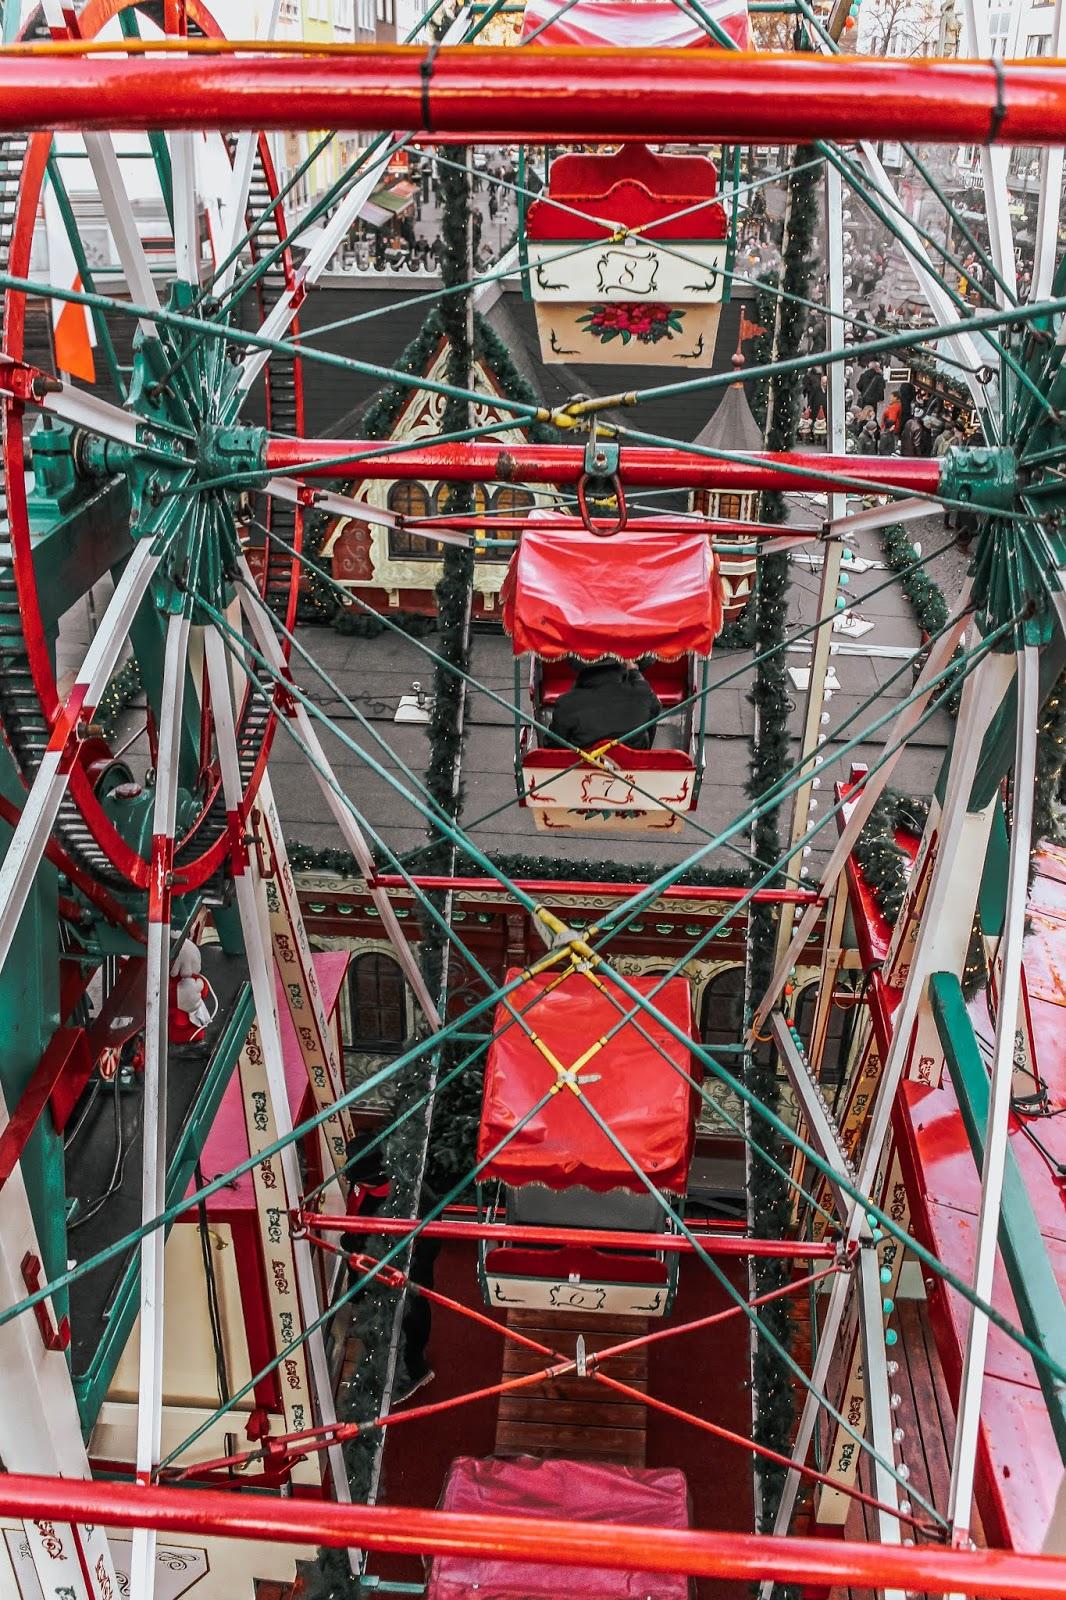 German Christmas Market Ferris Wheel